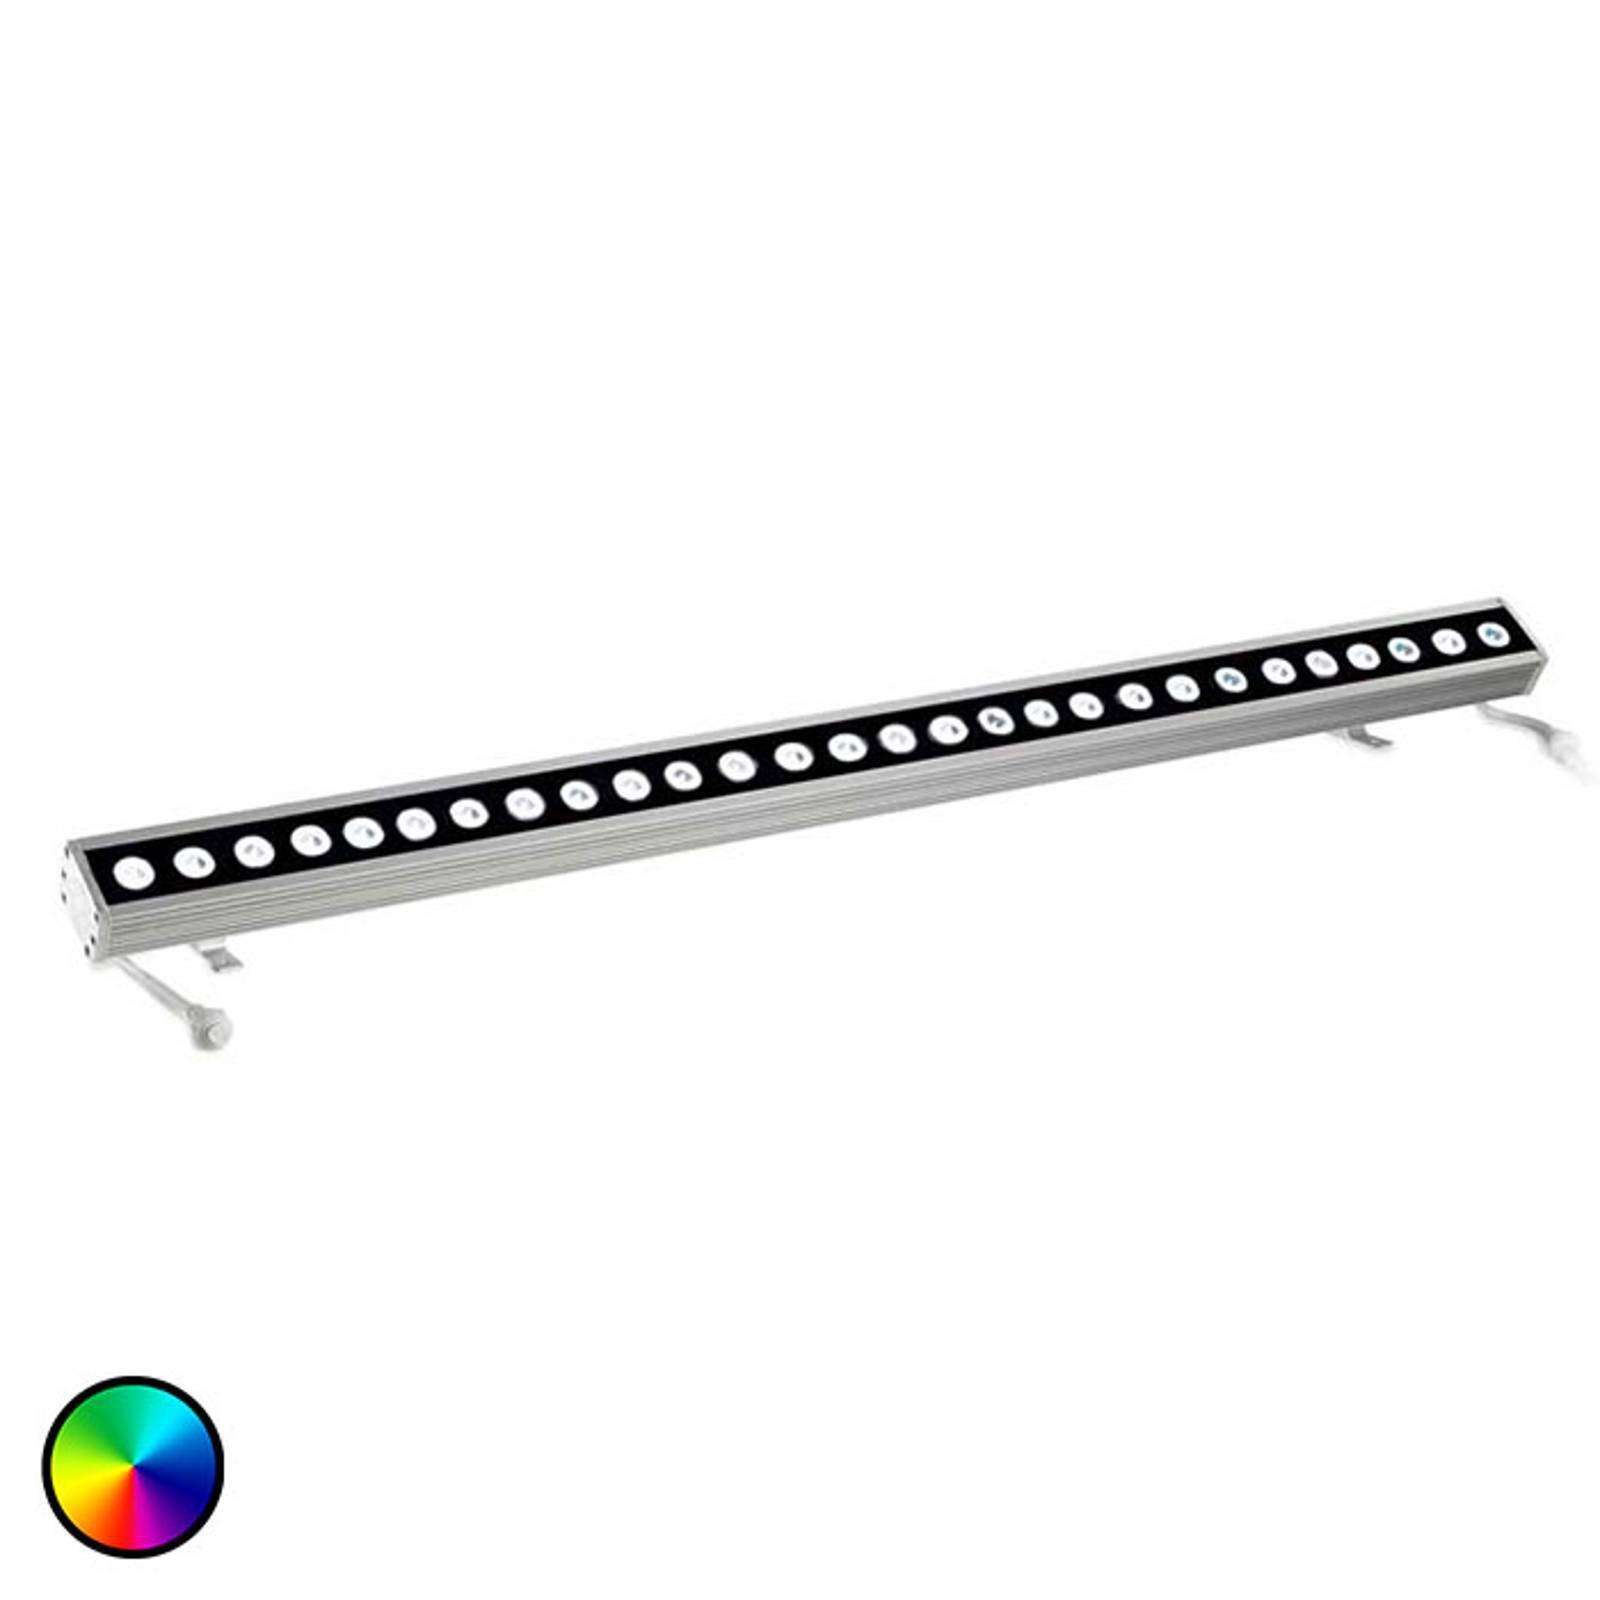 LEDS-C4 Tron utendørs vegglampe RGB-LED